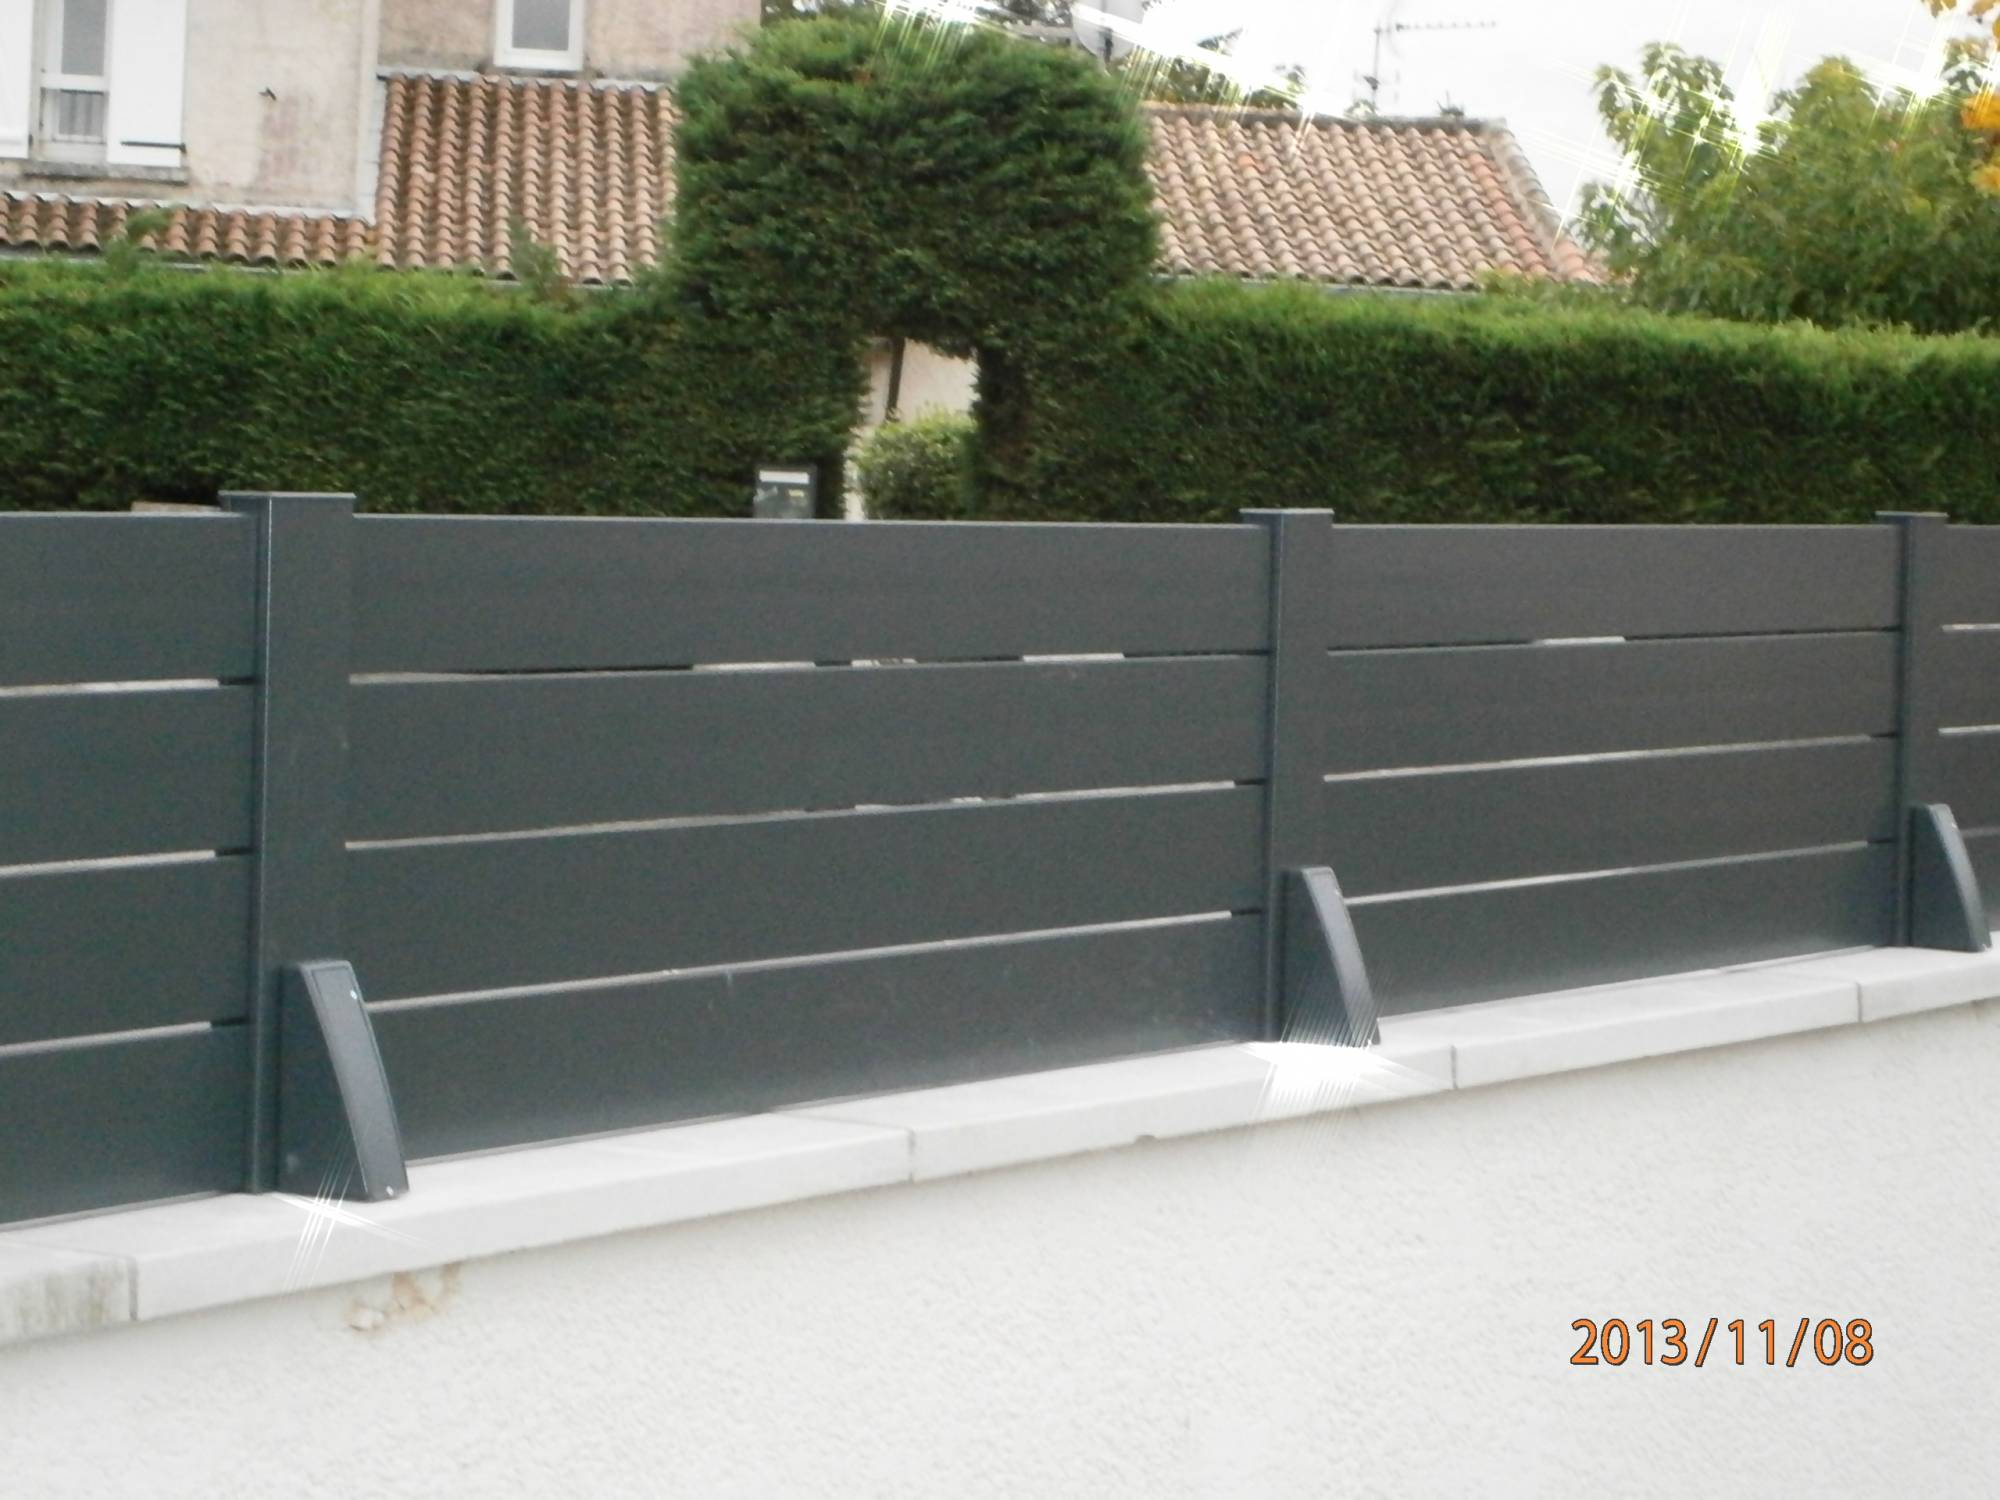 Cloture aluminium lames ajour liv a pash aluminium for Portail et cloture alu